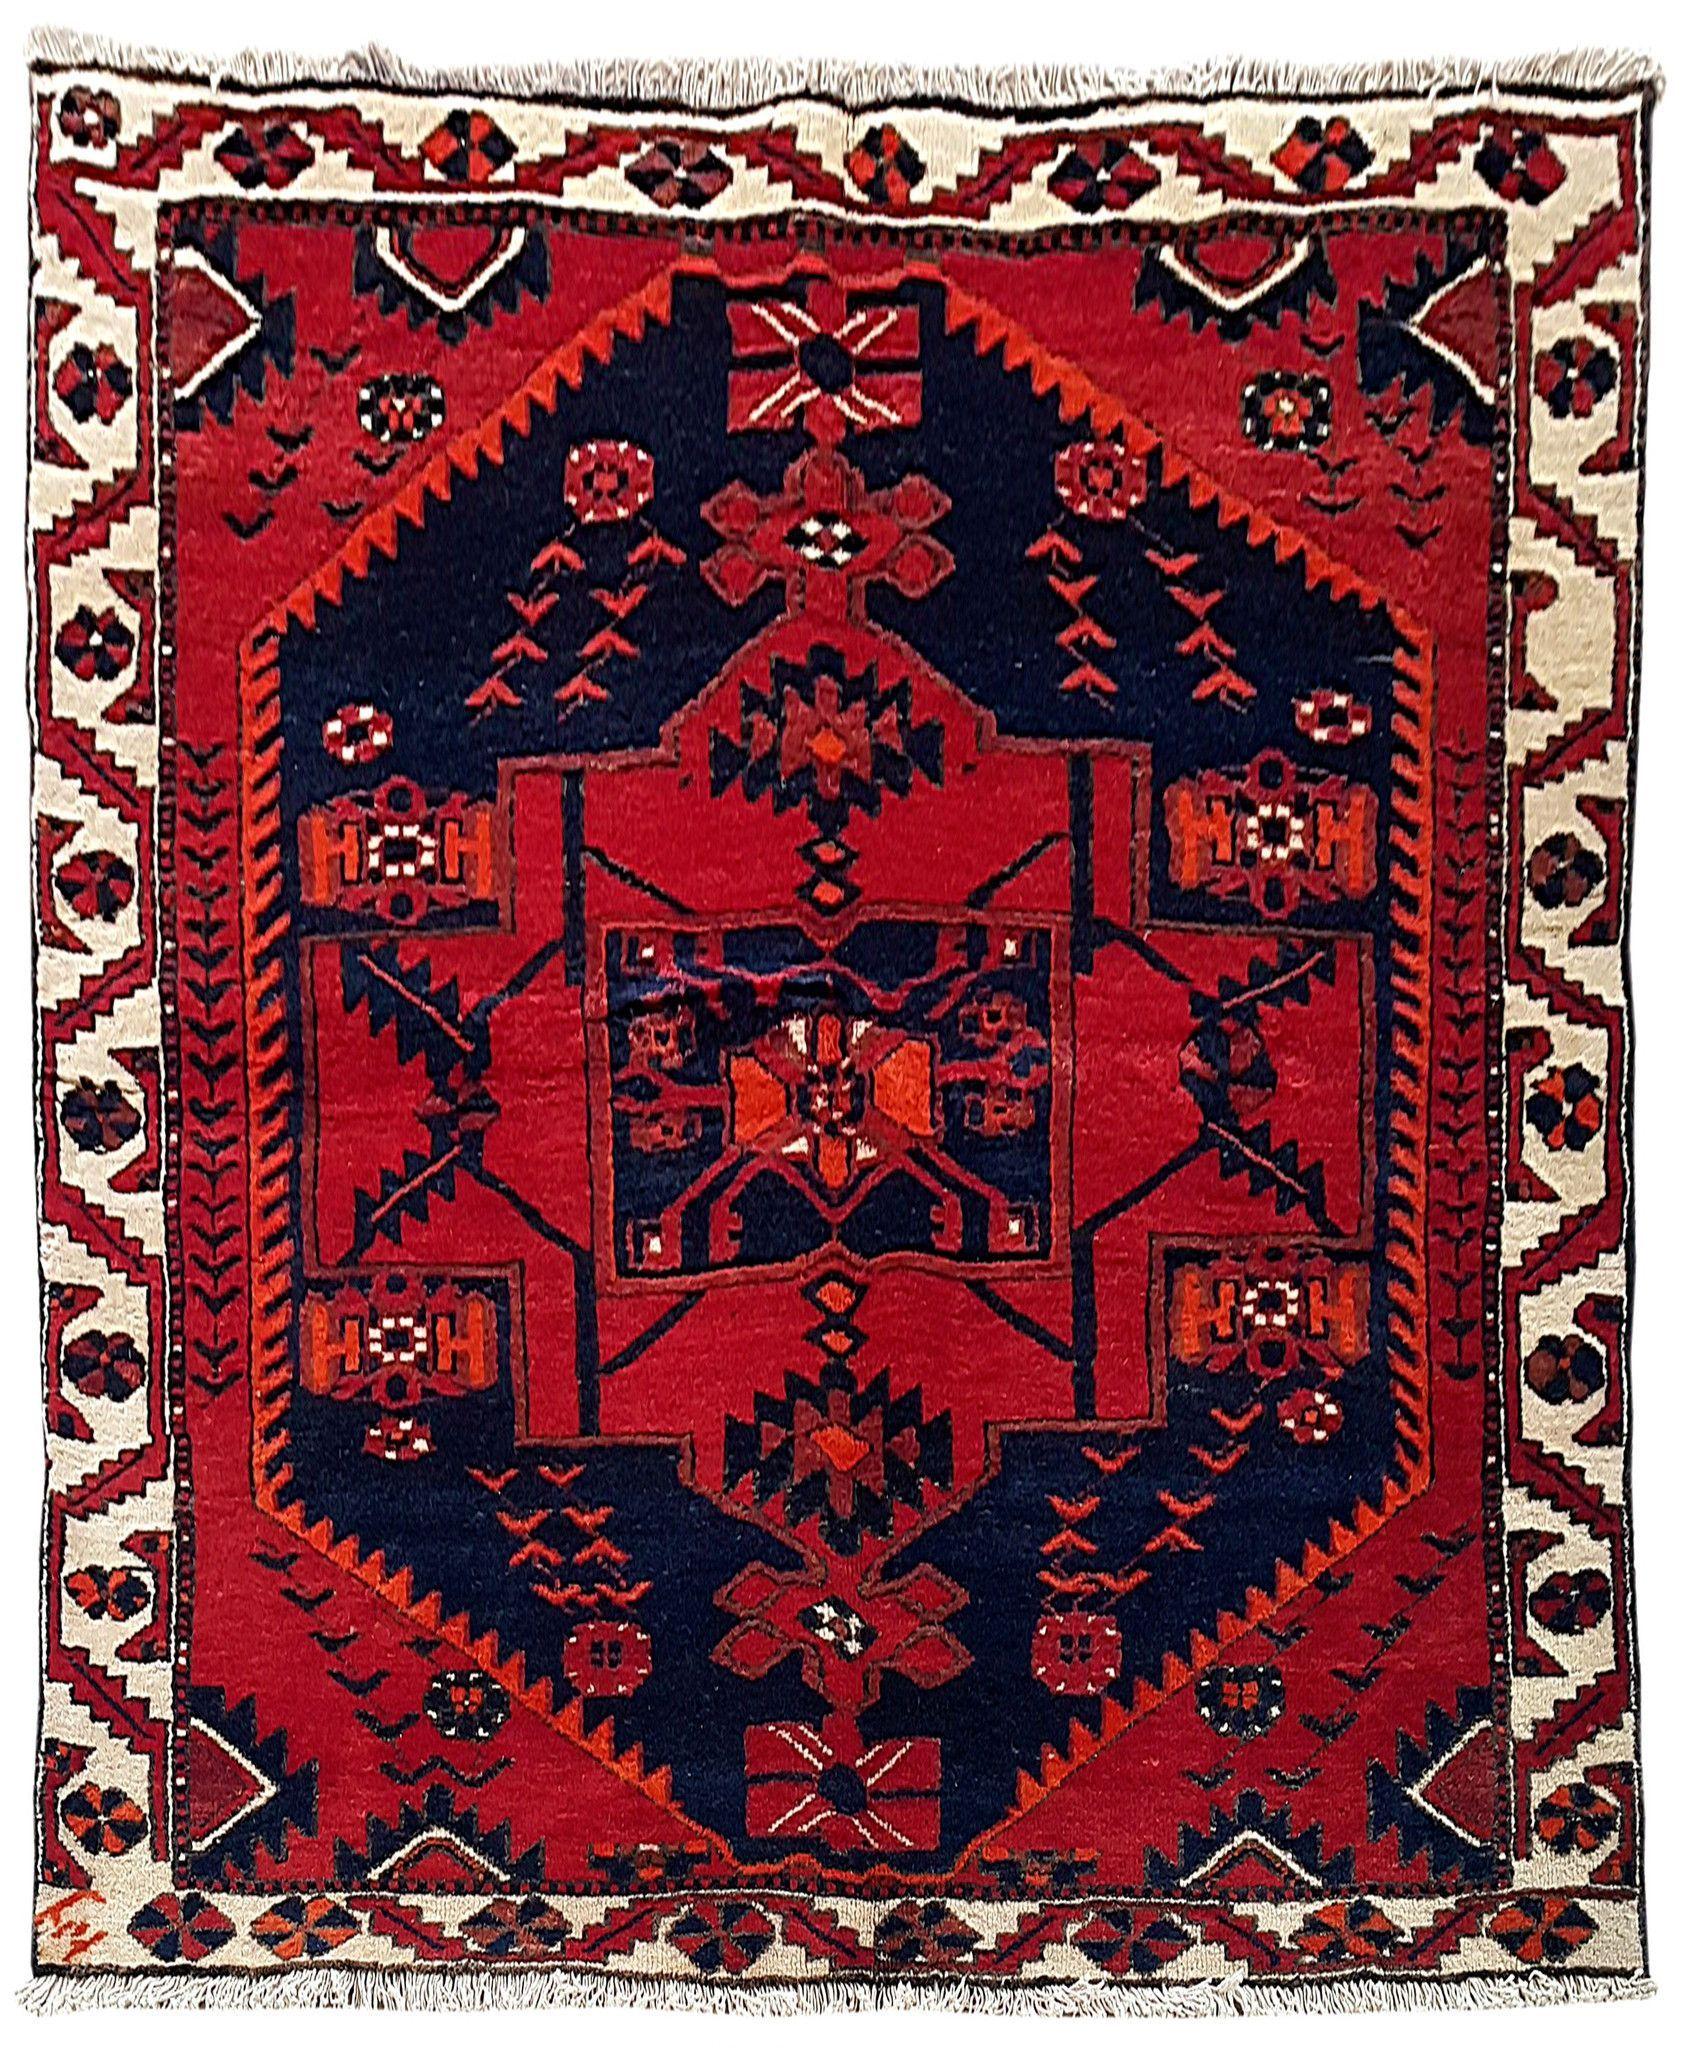 Rugs Online Handmade Rug 5x7 Persian Bakhtiari Carpet